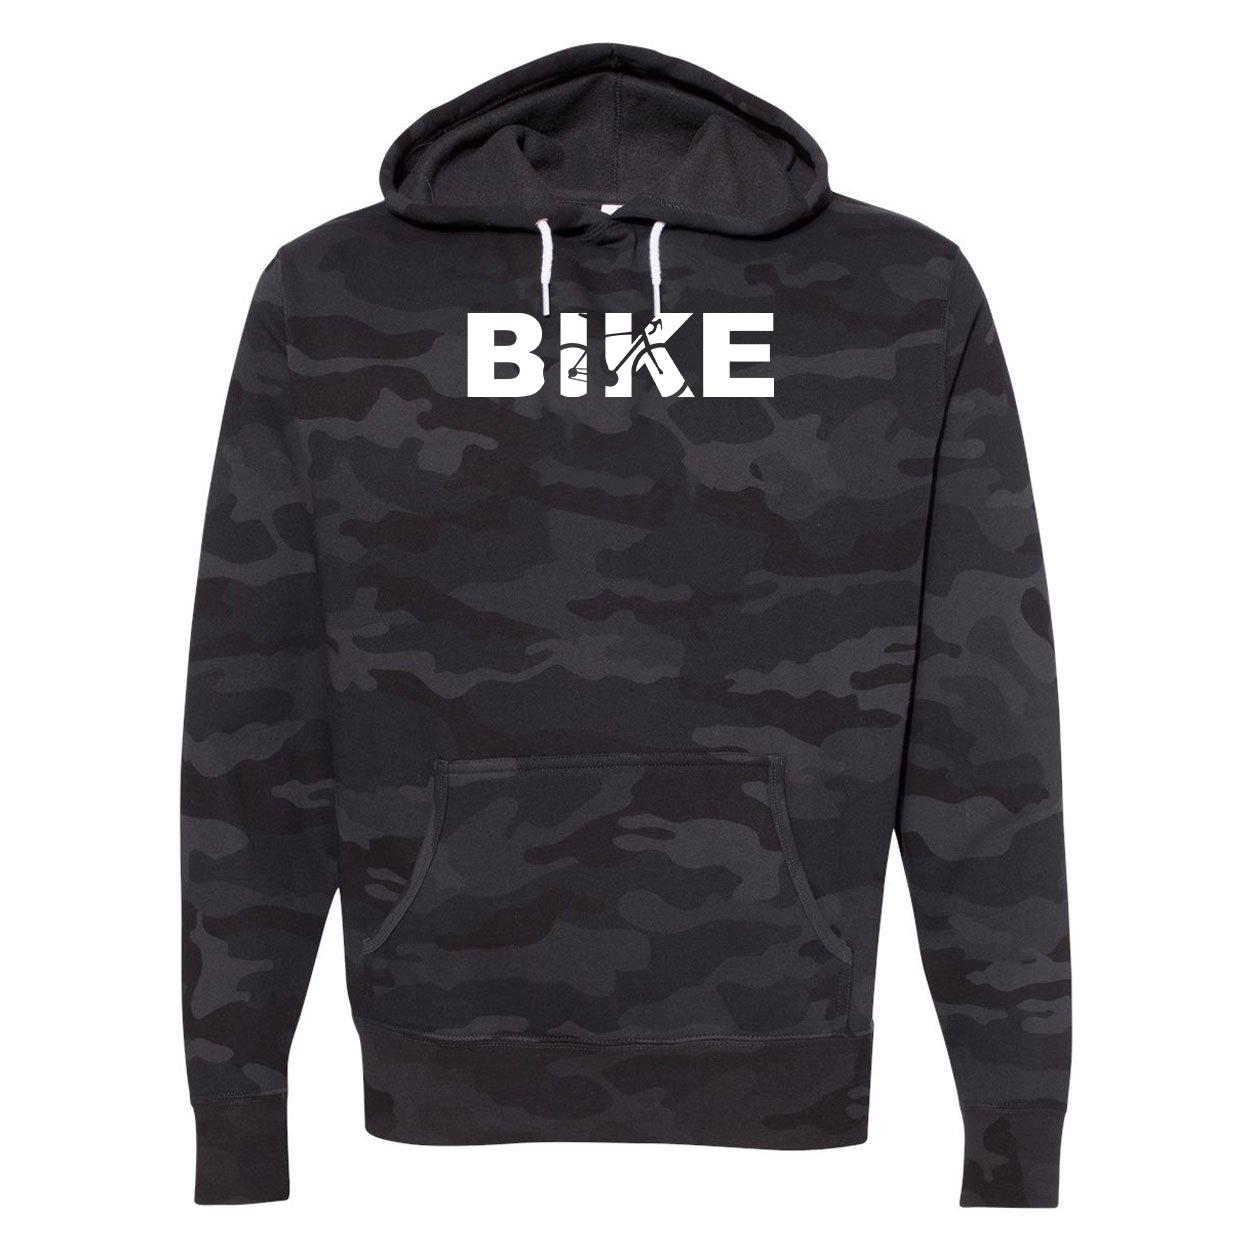 Bike Cycling Logo Classic Unisex Hooded Sweatshirt Black Camo (White Logo)